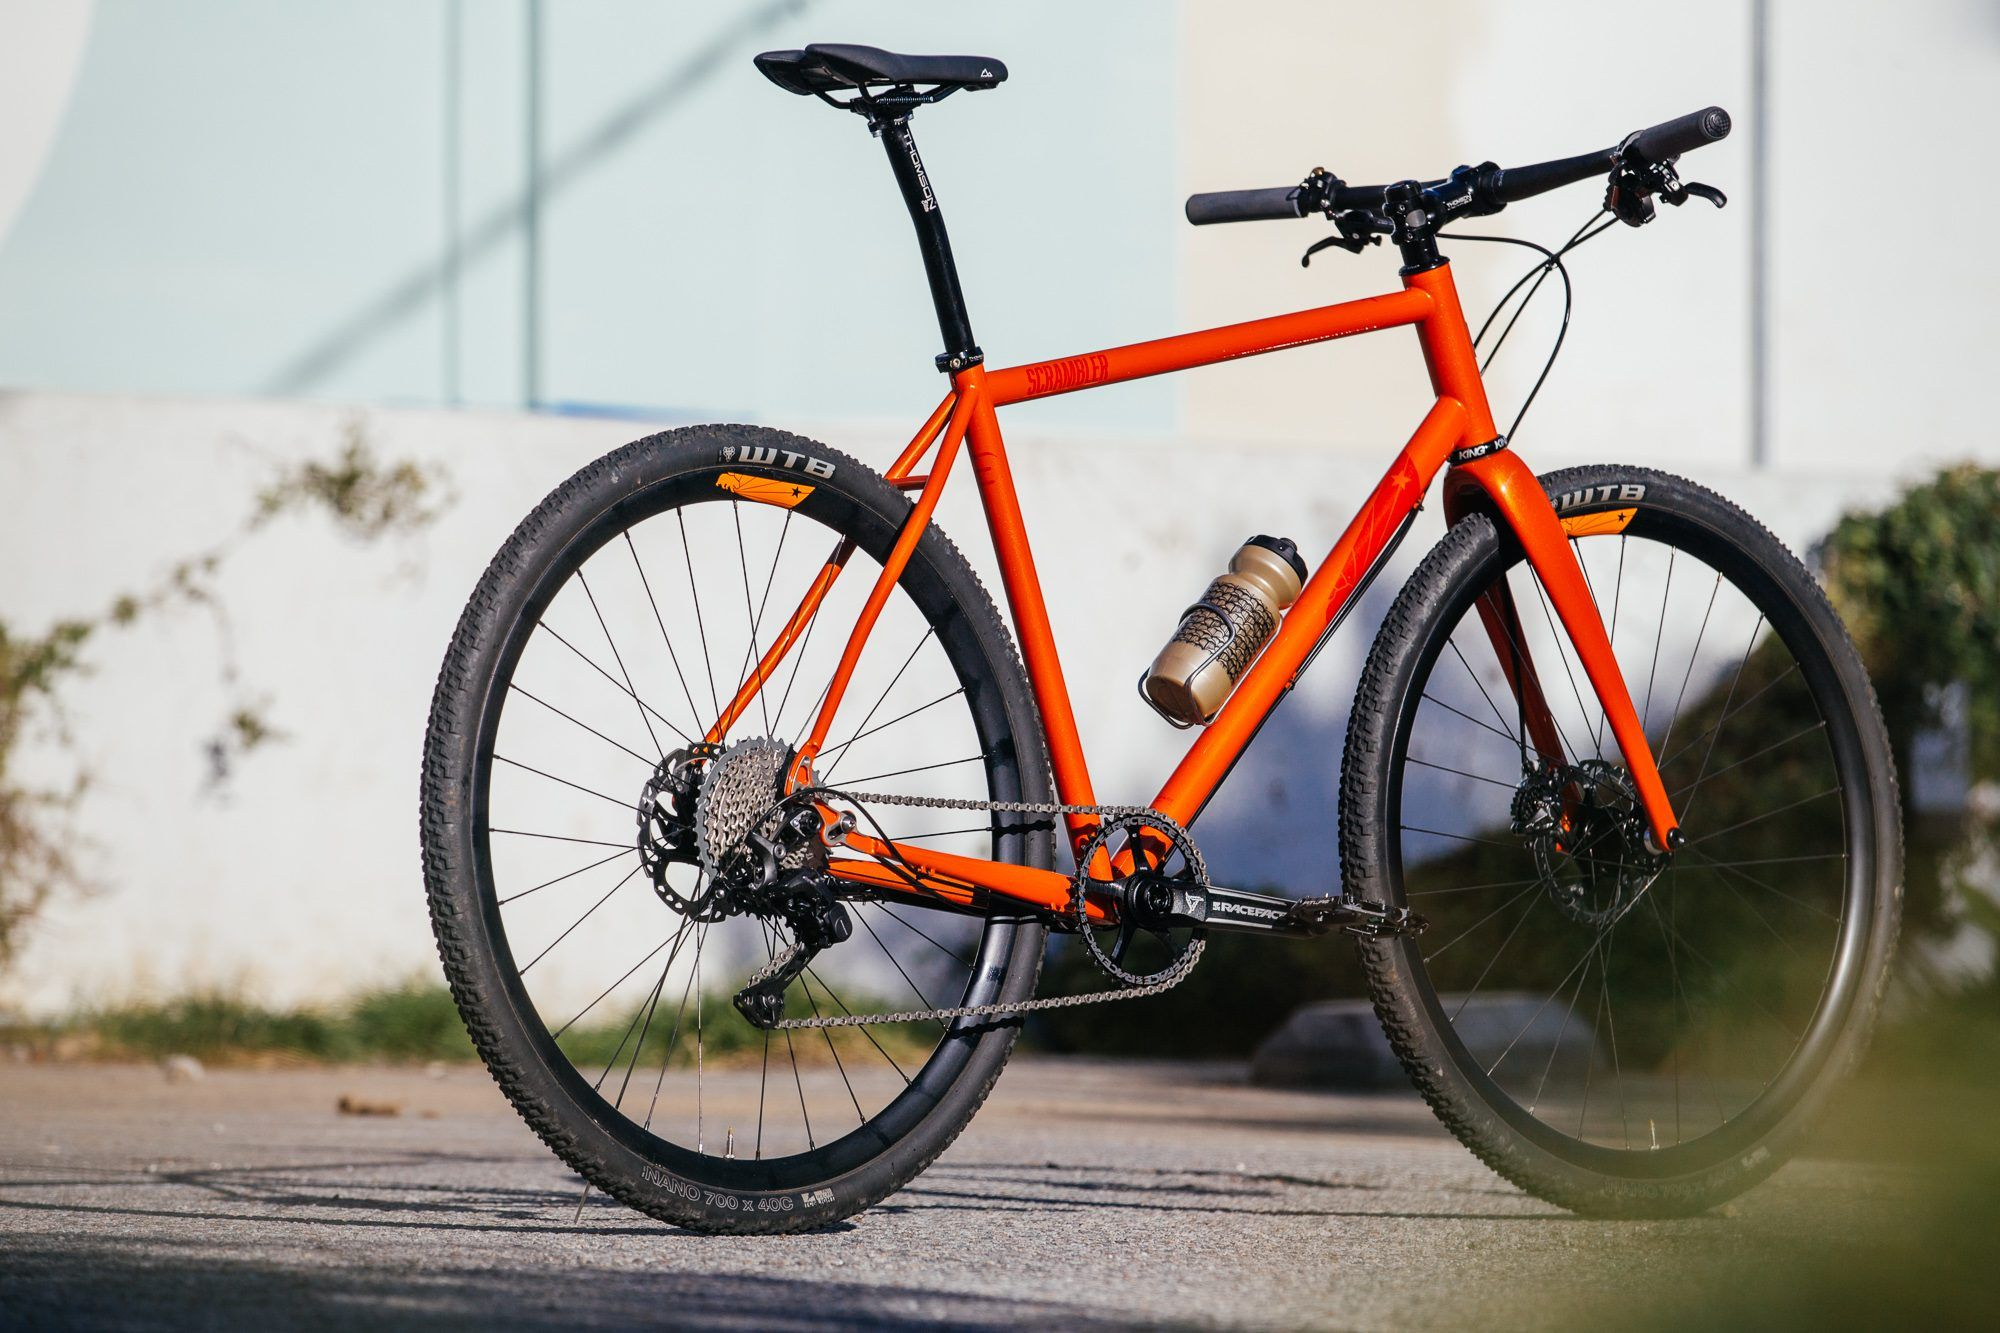 Don T Call It A Cross Bike The Caletti Scrambler Flat Bar City